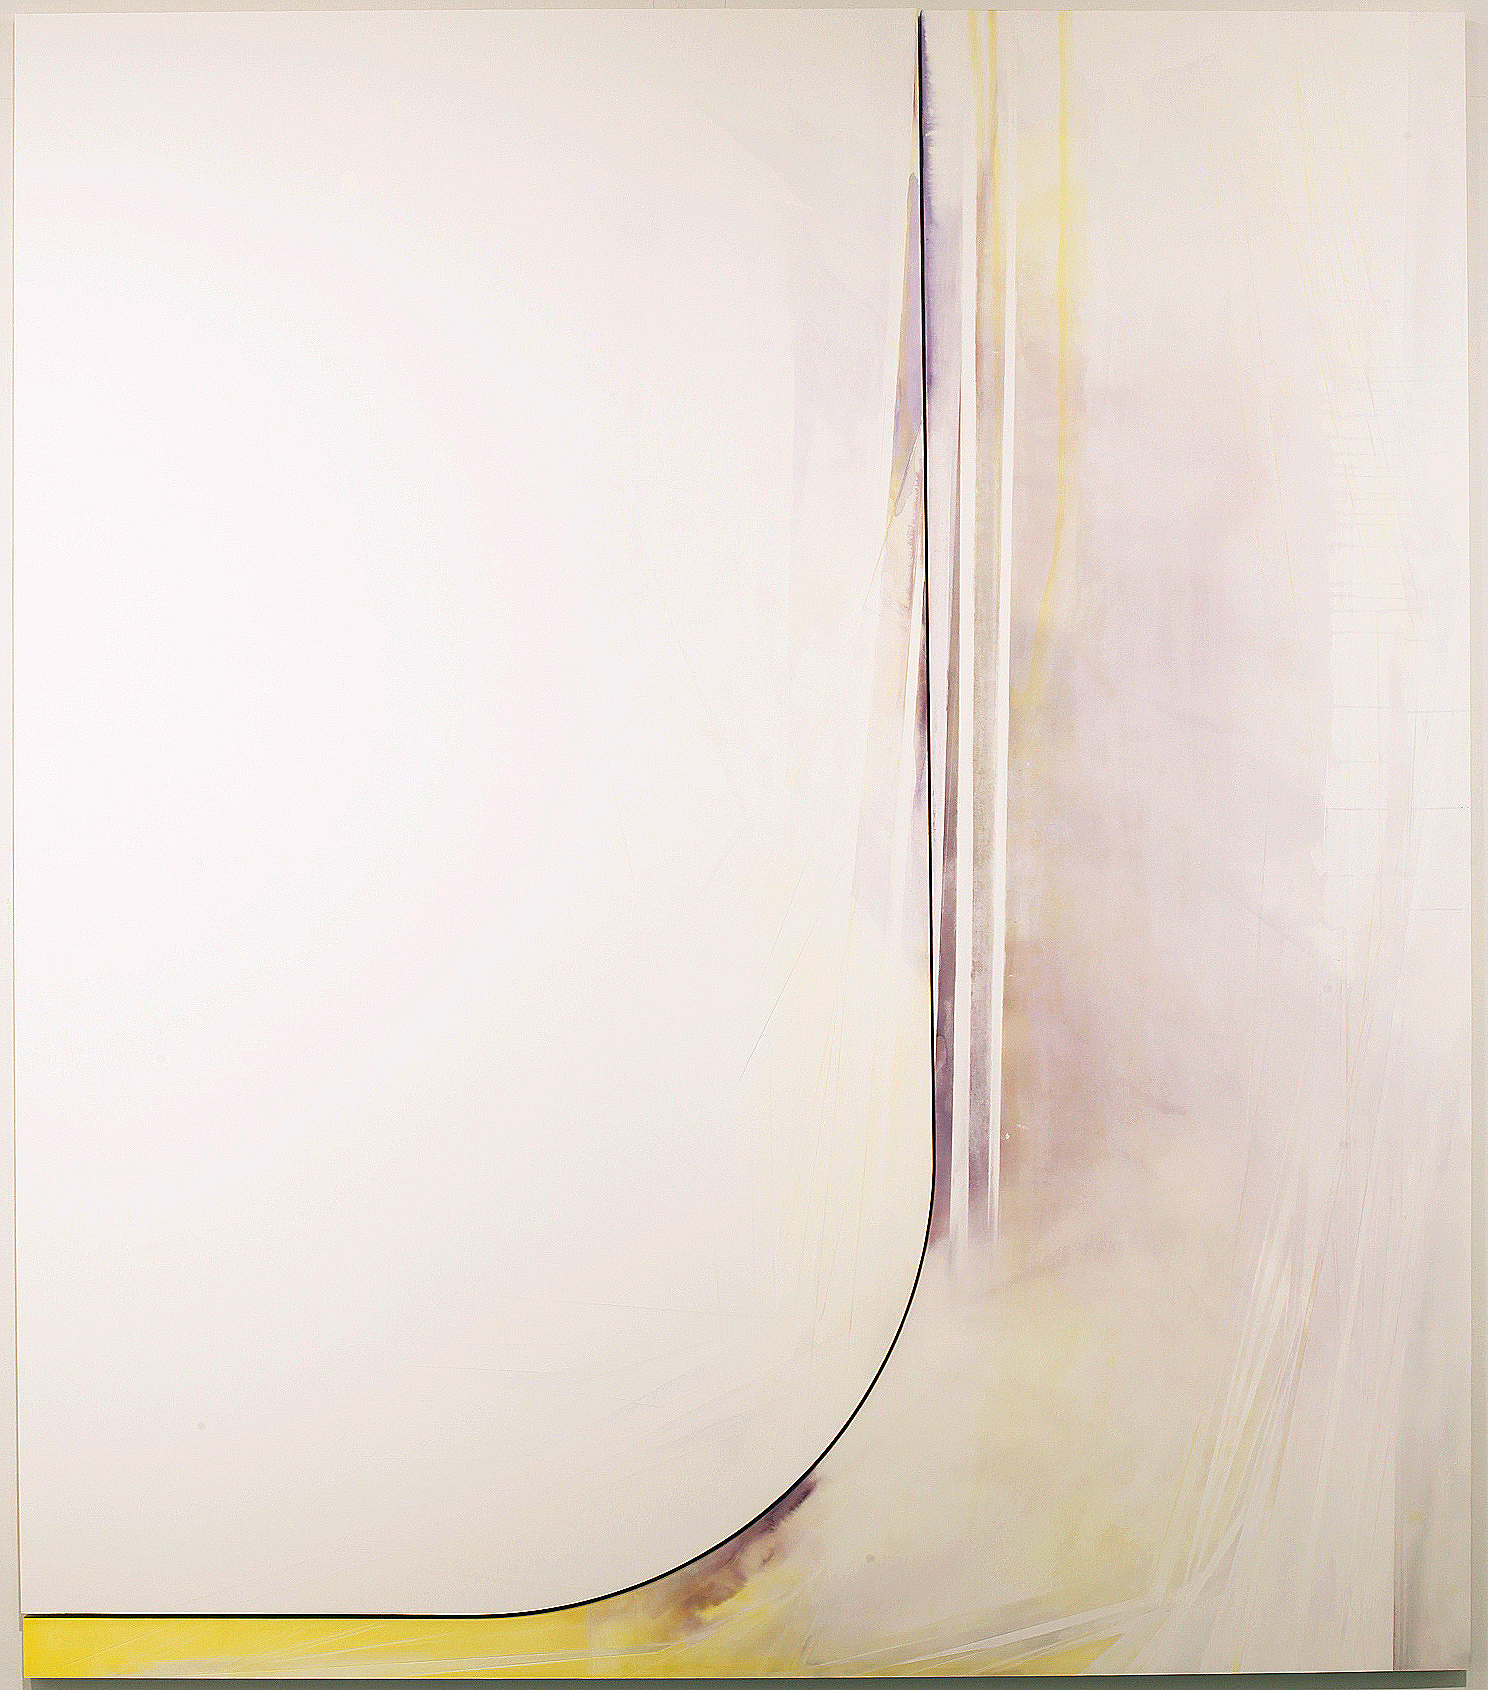 Untitled (proximity), 2012